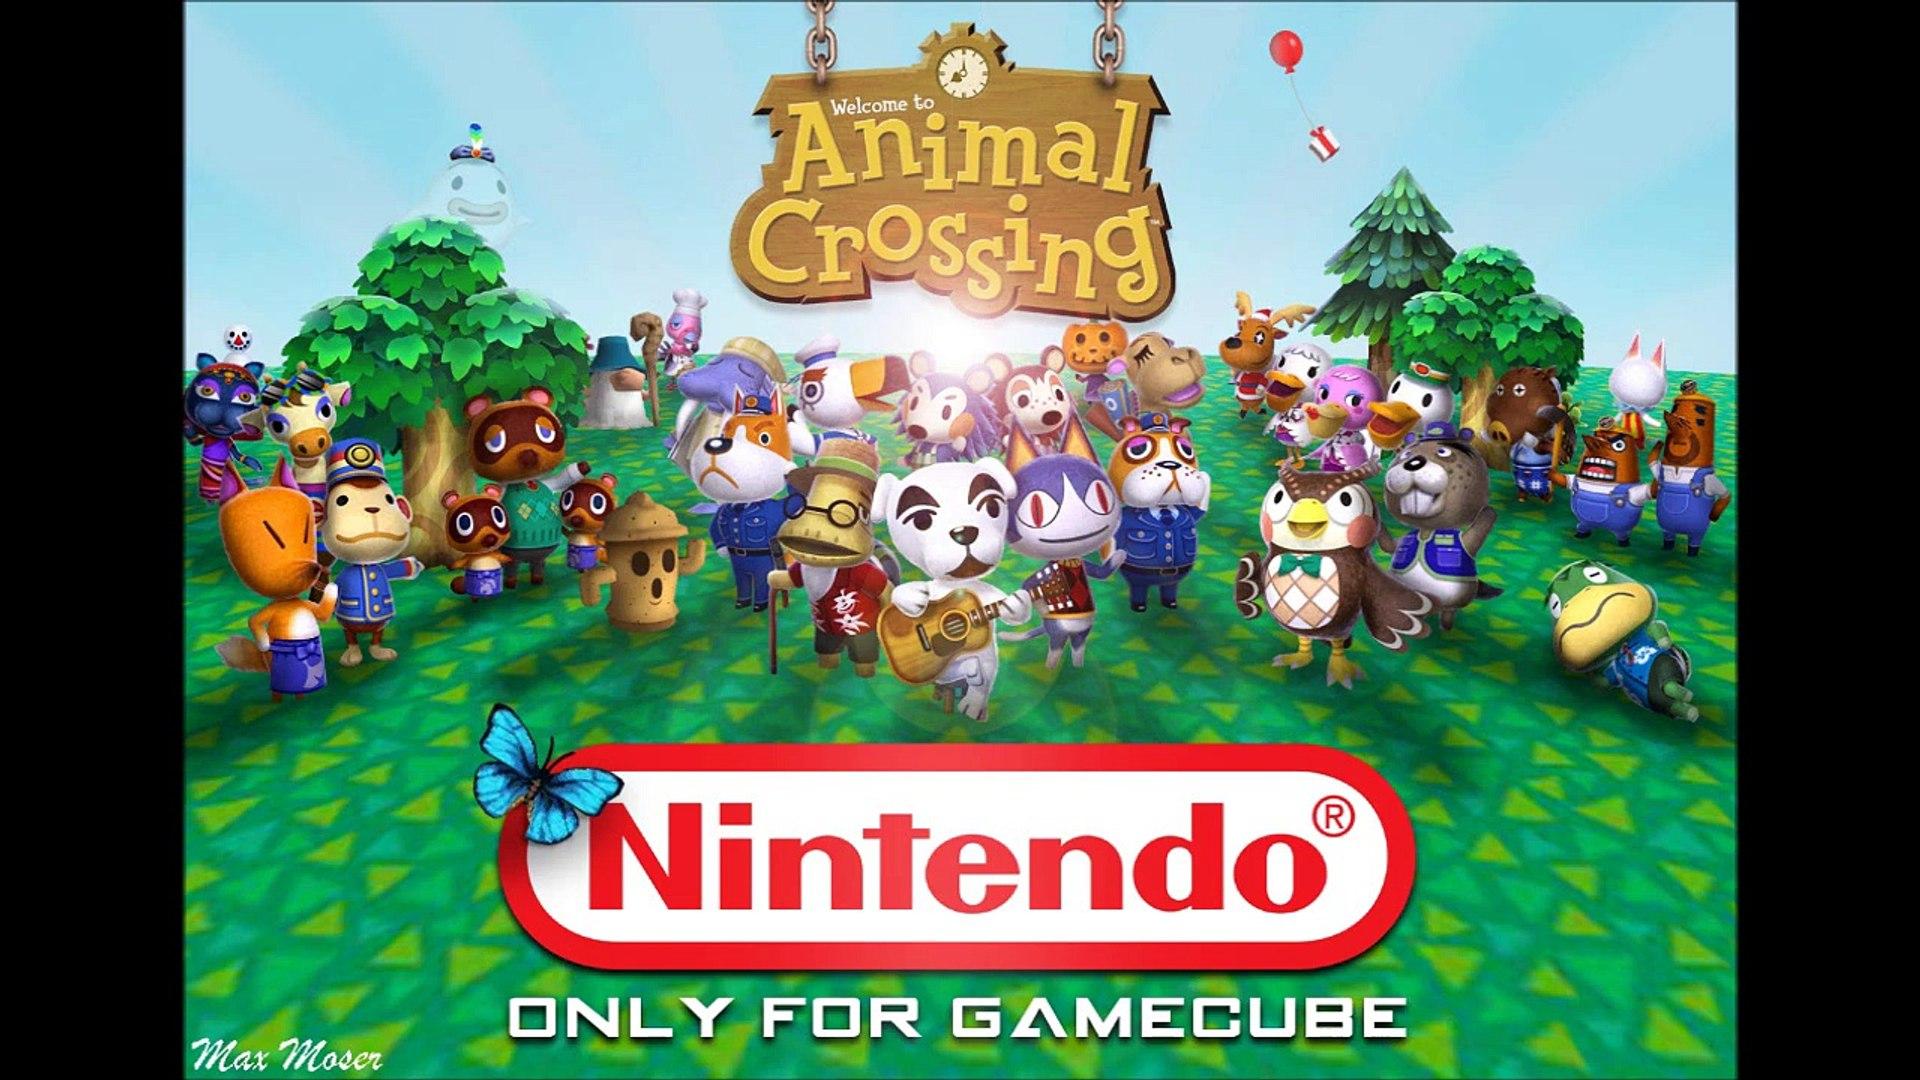 Animal Crossing Desktop Wallpapers